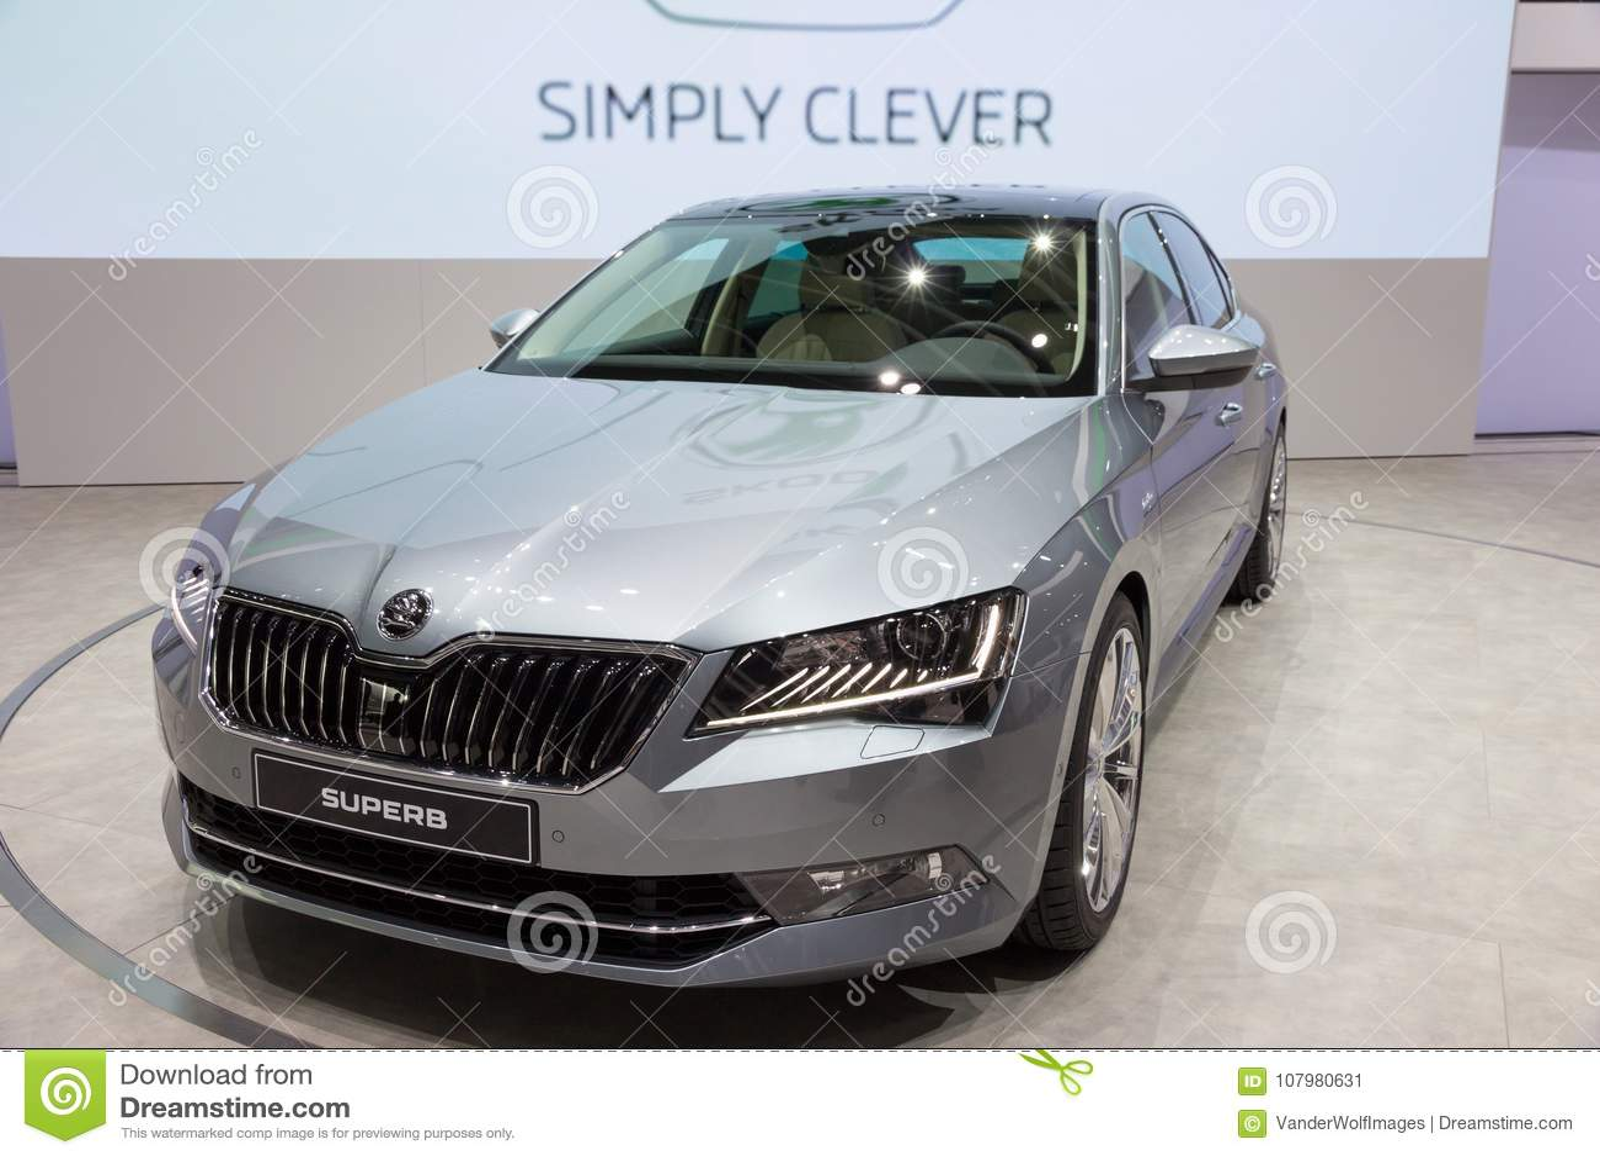 new 2015 skoda superb car editorial photo image of automobile 107980631